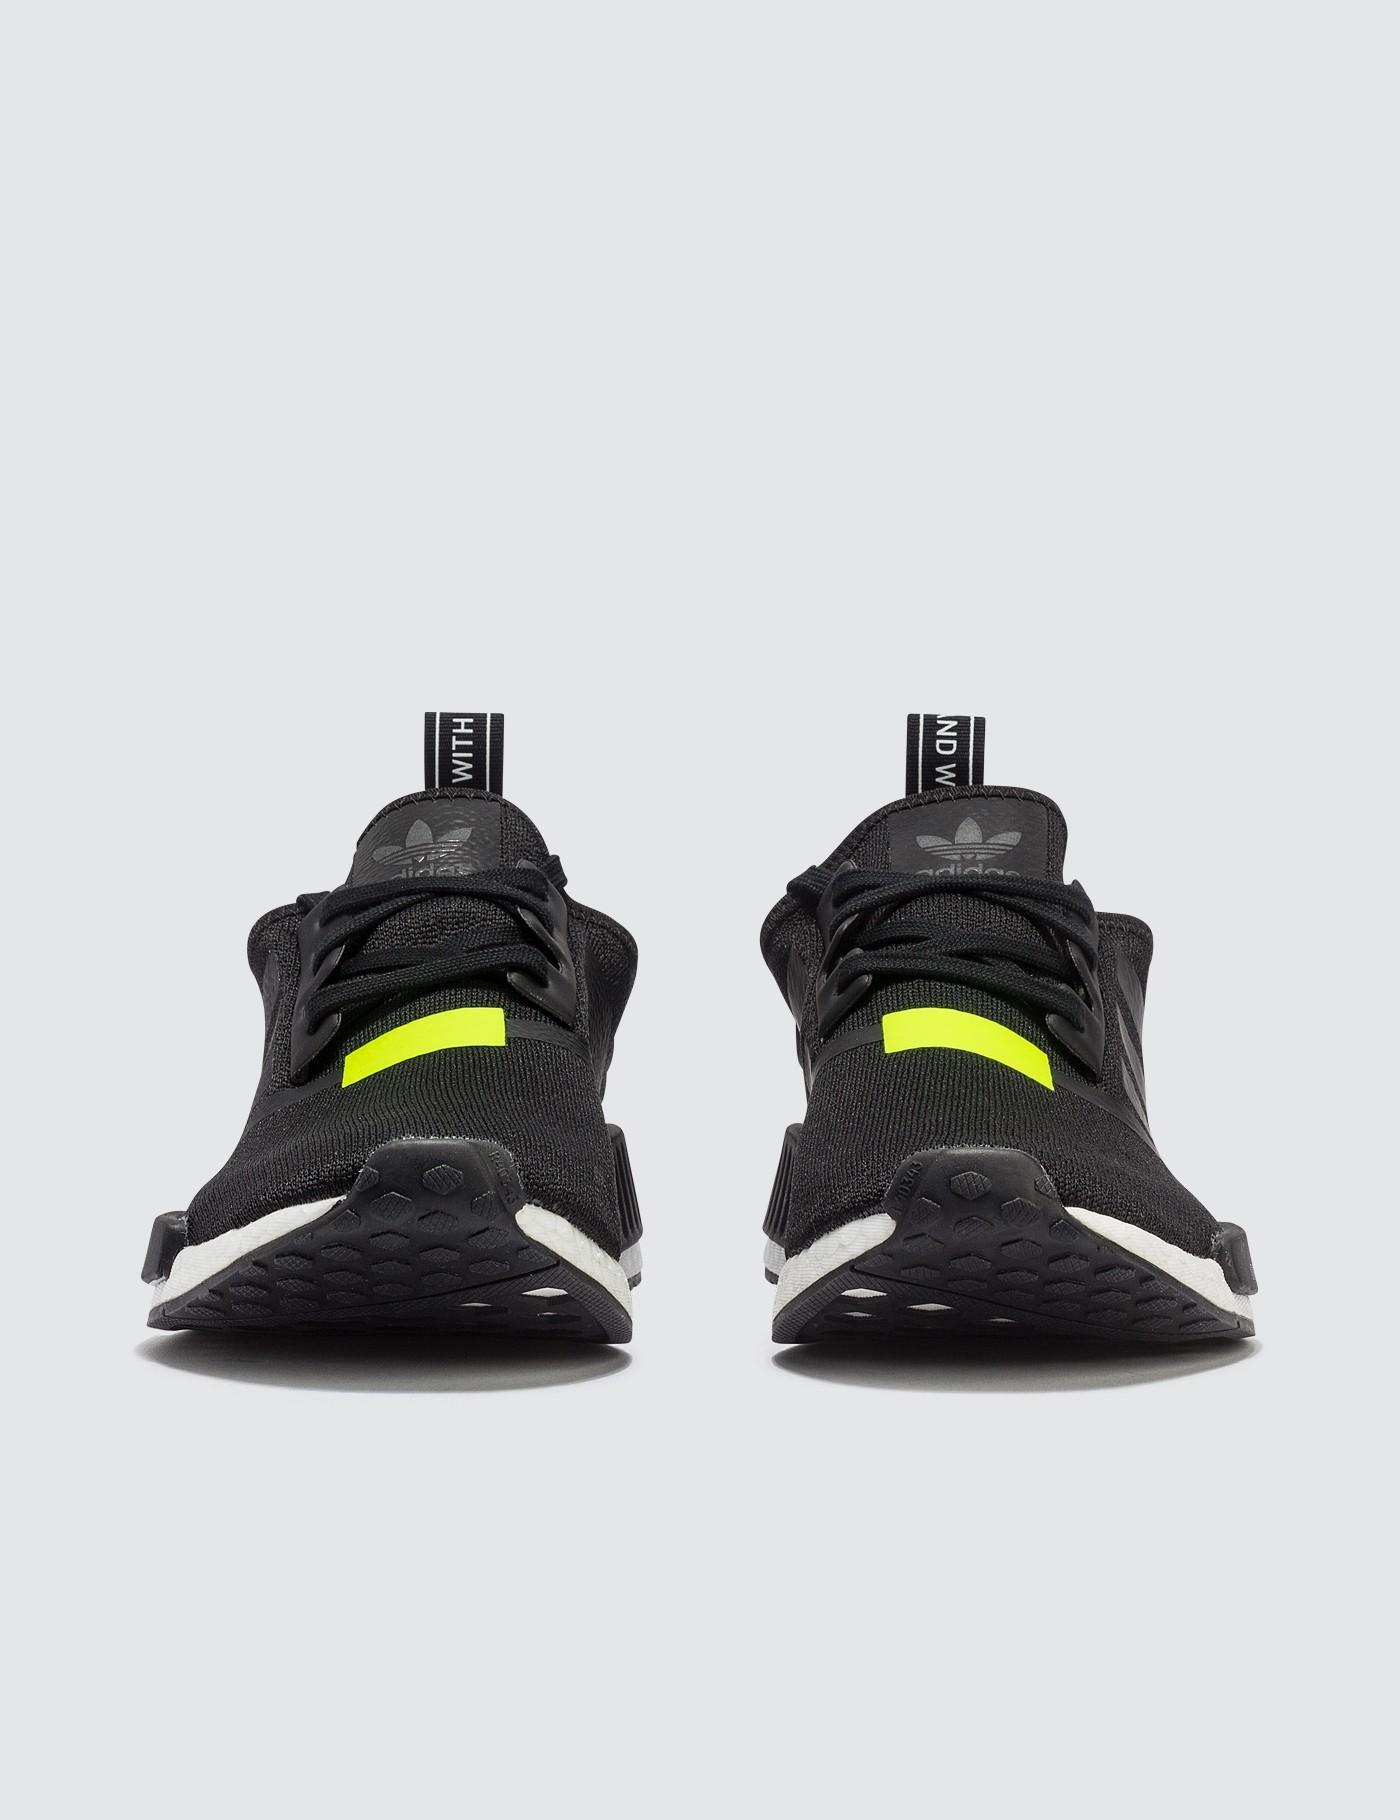 0ba40c1fe Lyst - adidas Originals Nmd R1 in Black for Men